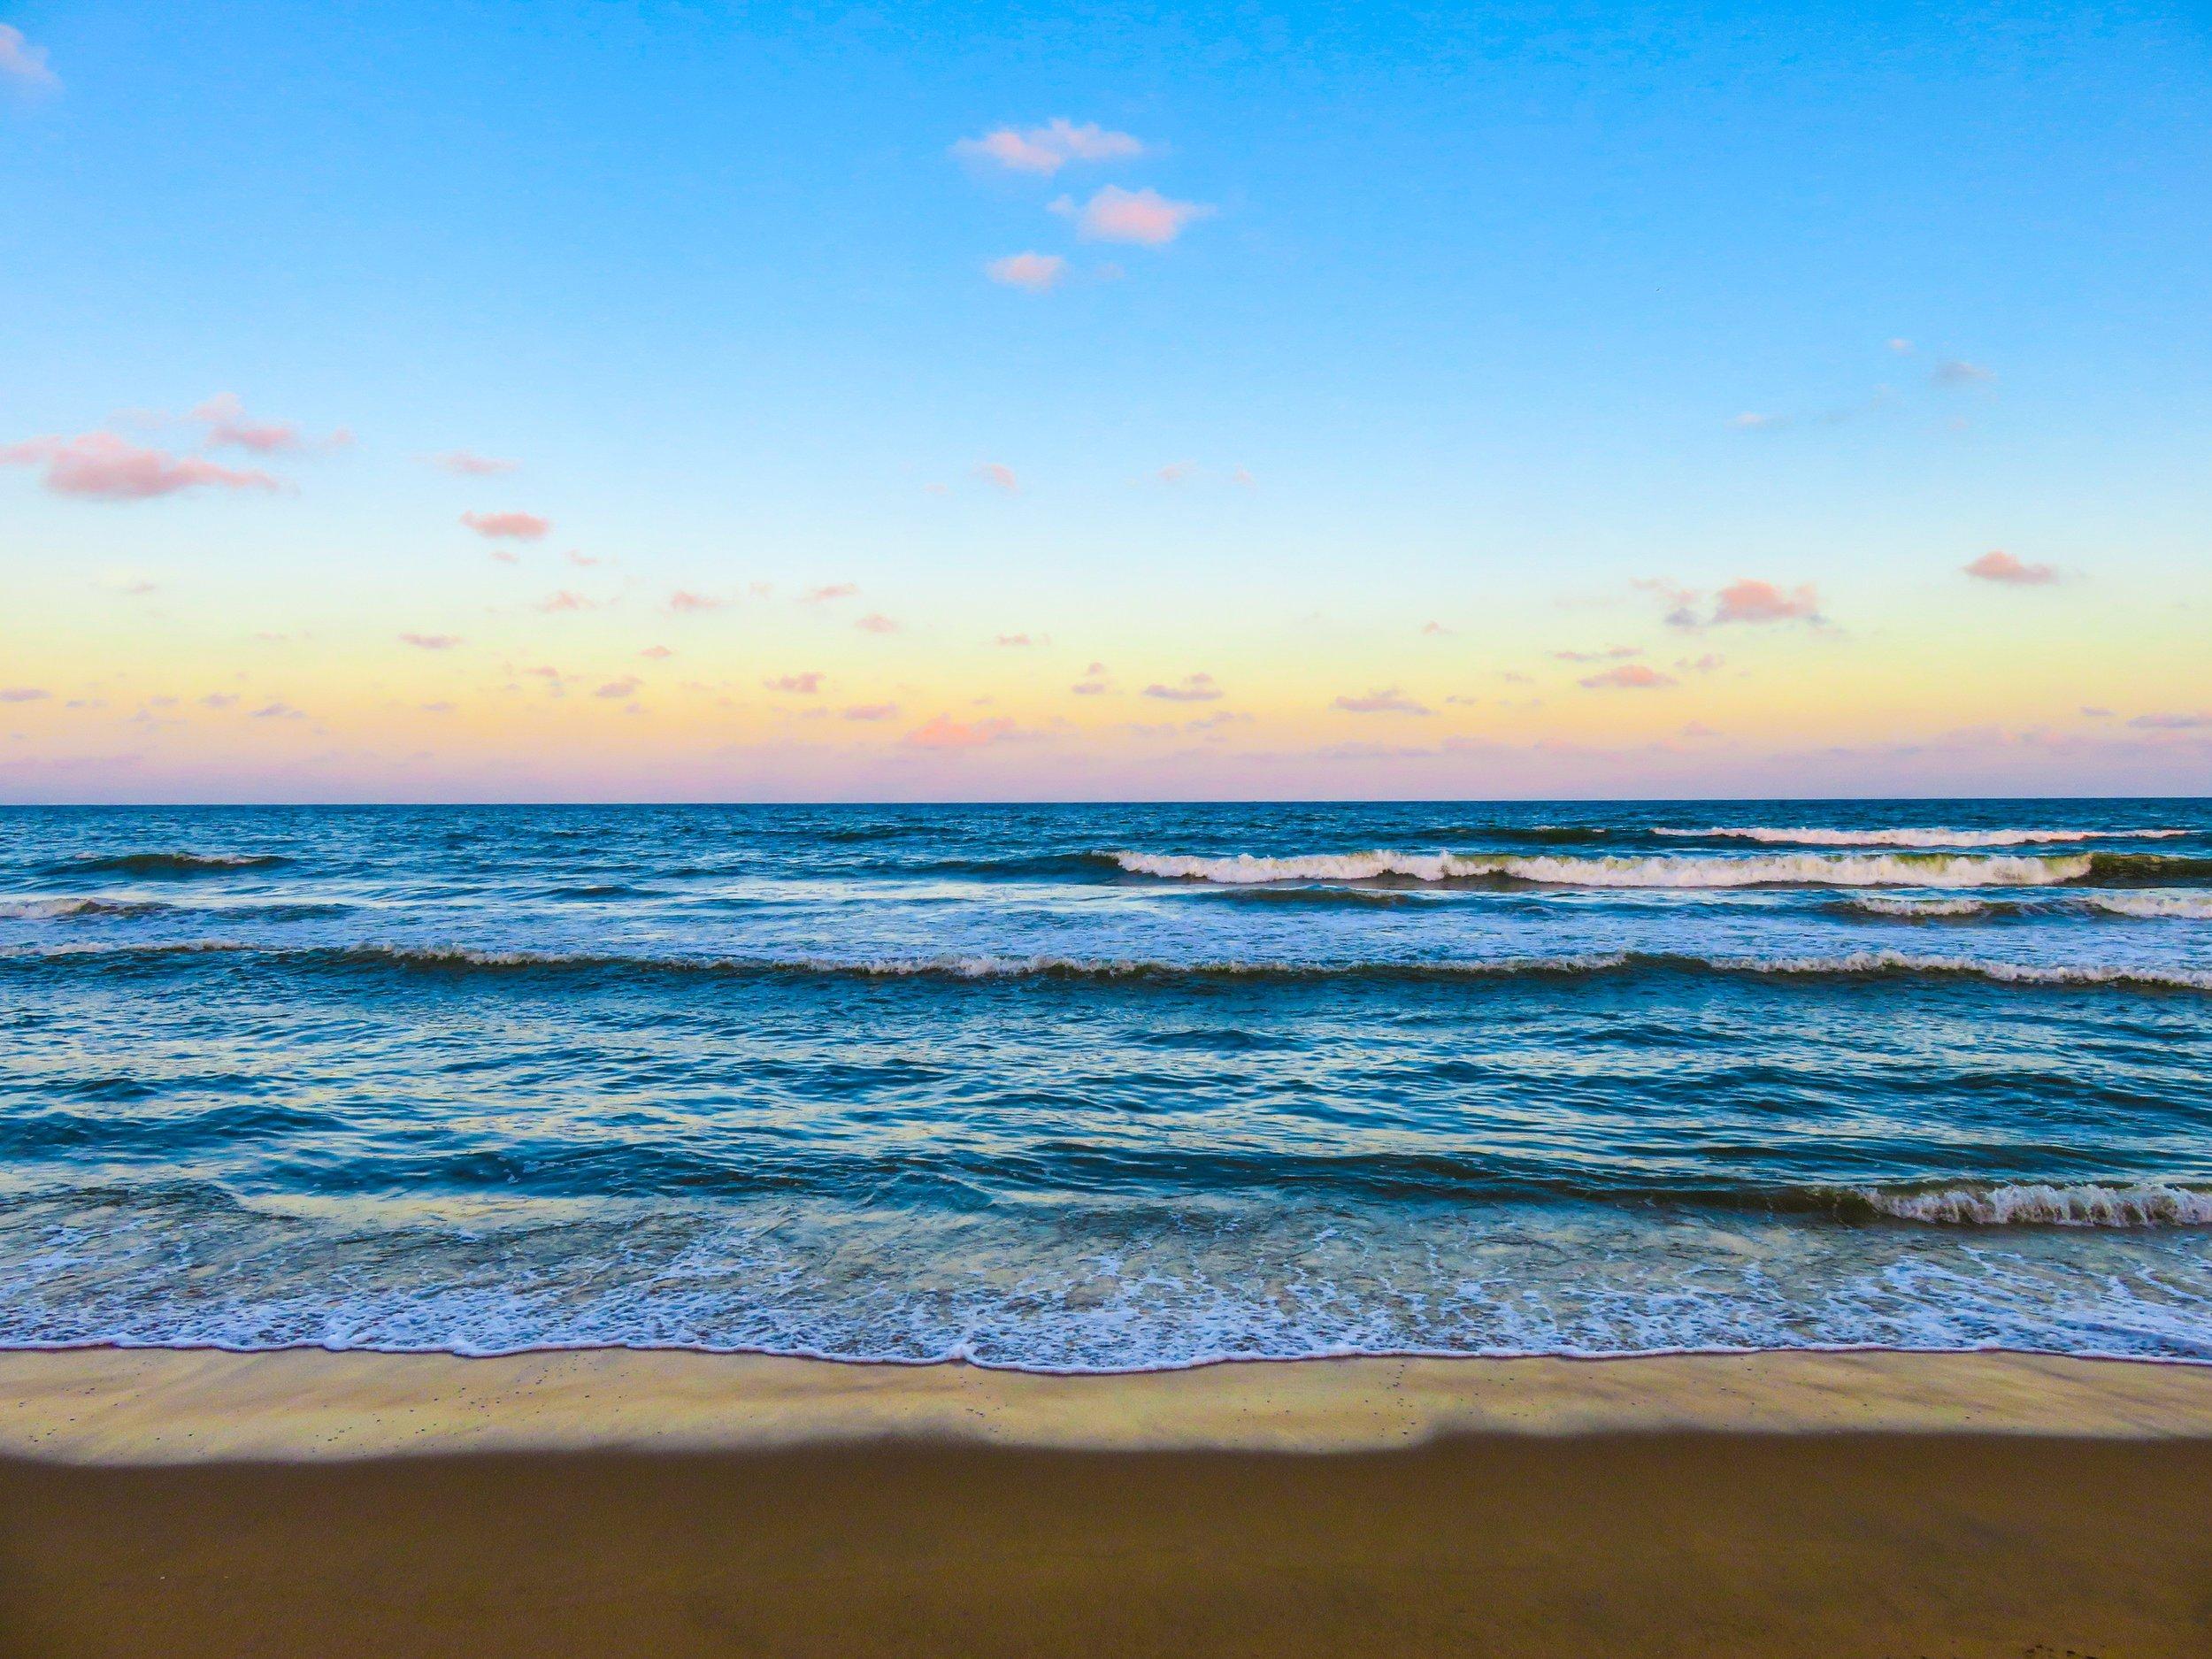 beach-dusk-nature-62389.jpg